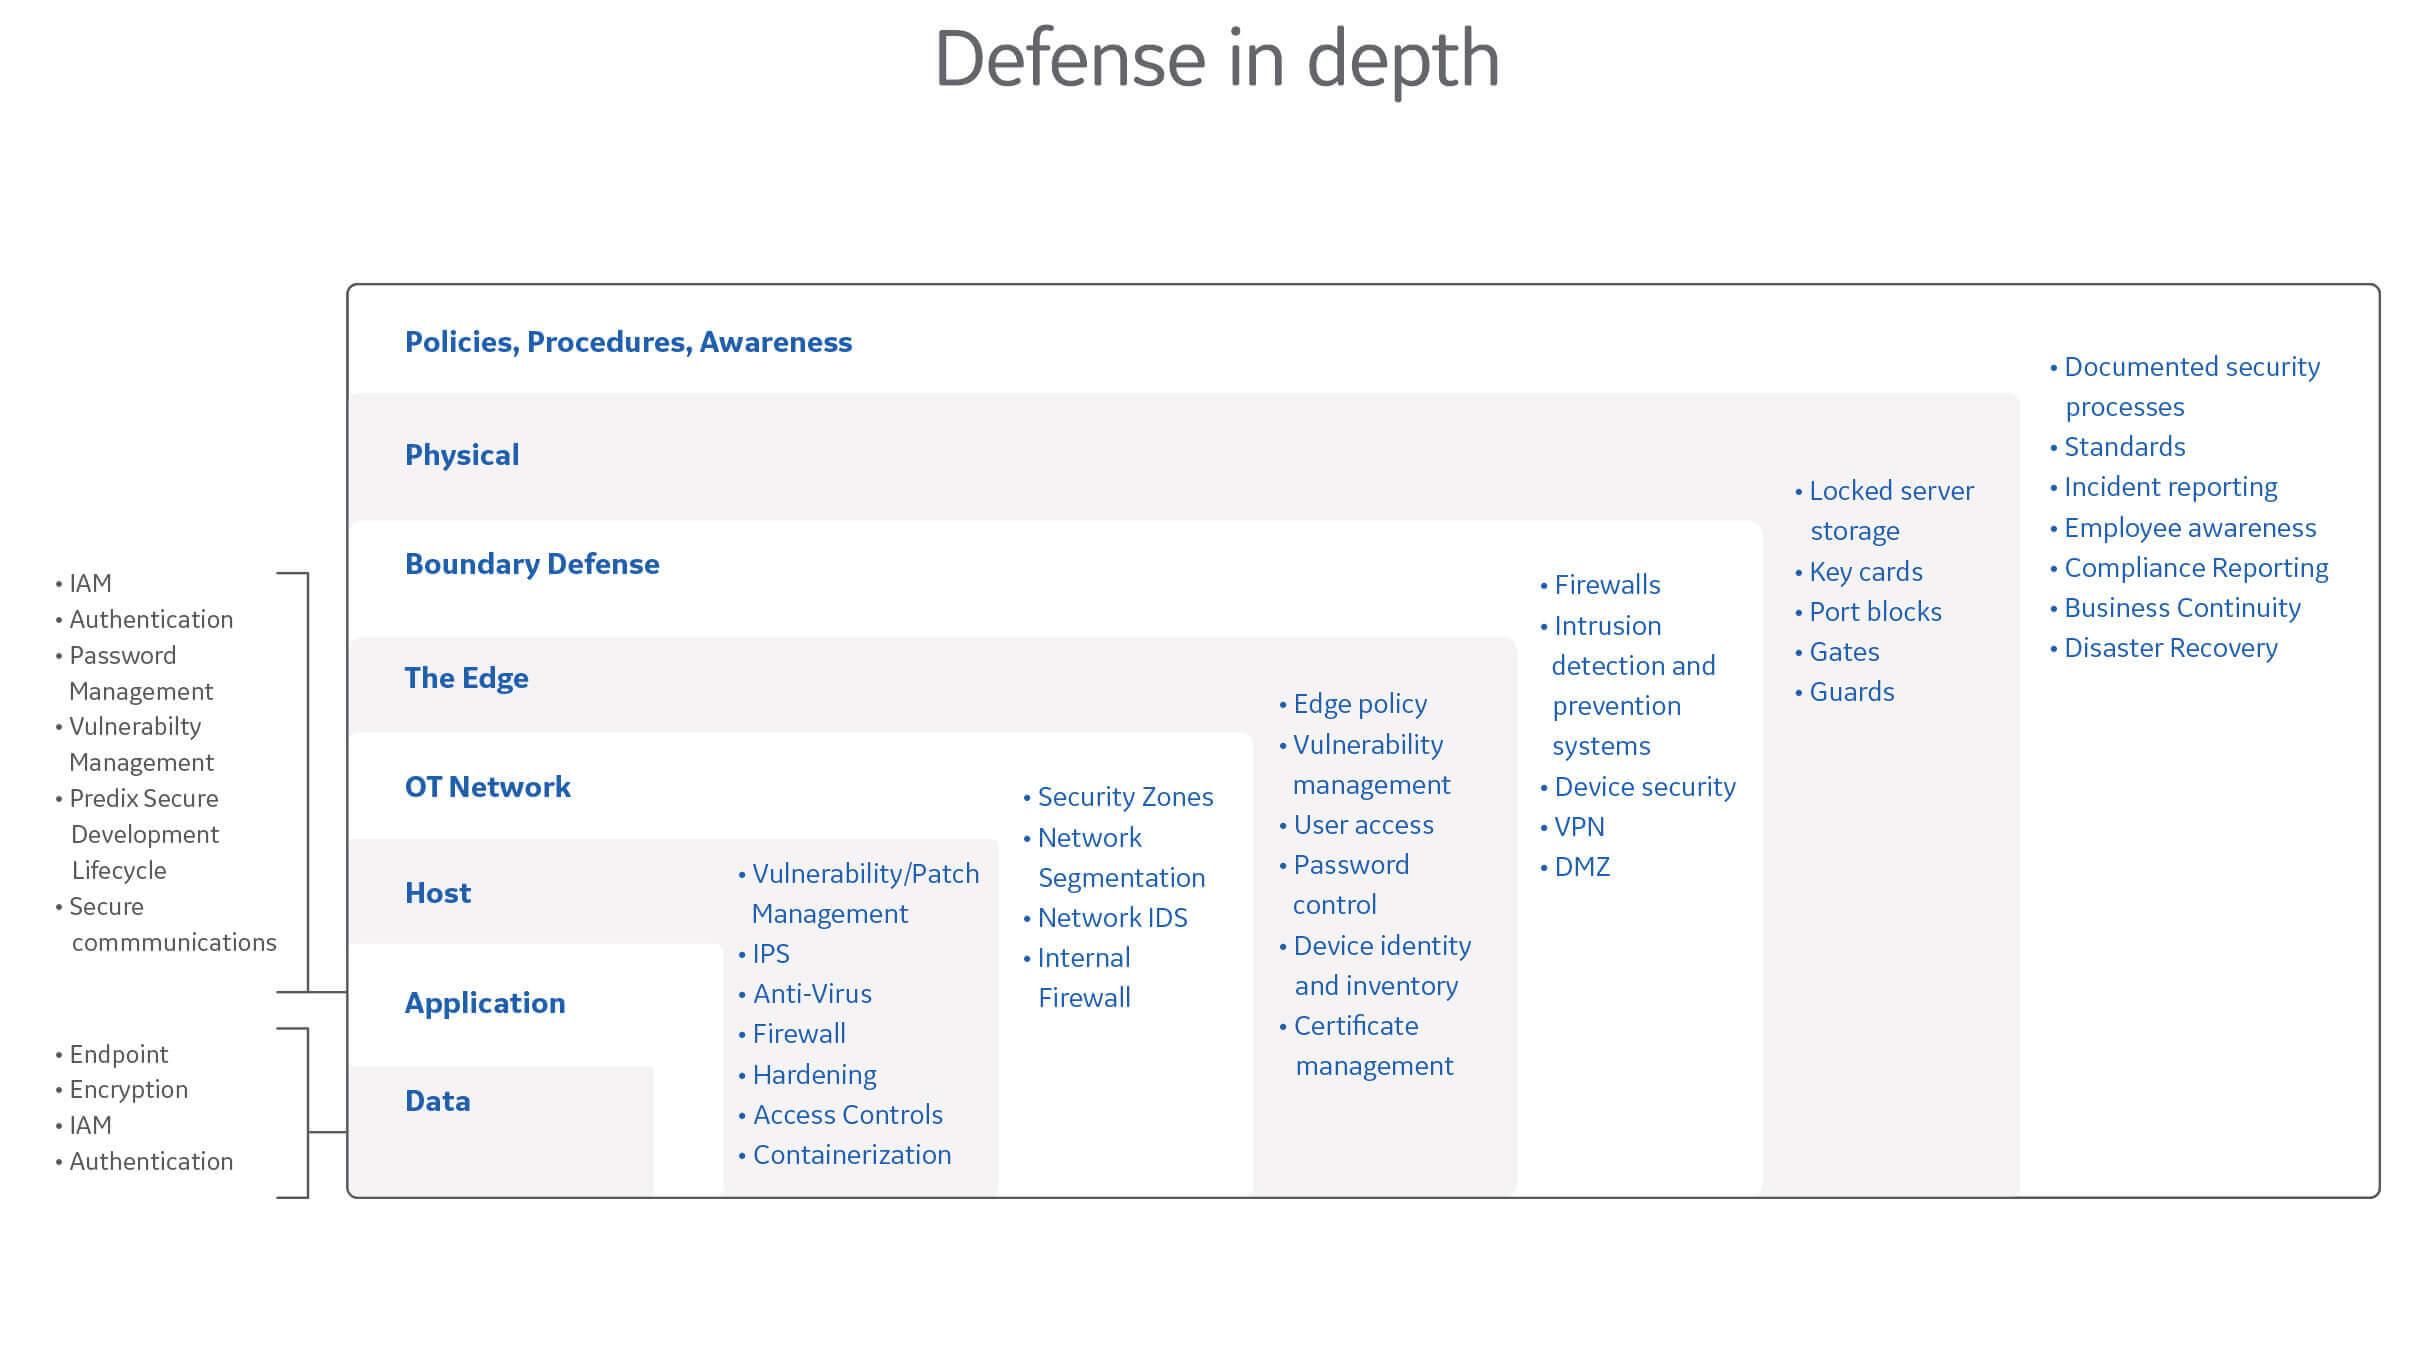 module security chart defense in defensemodule security chart defense in defense